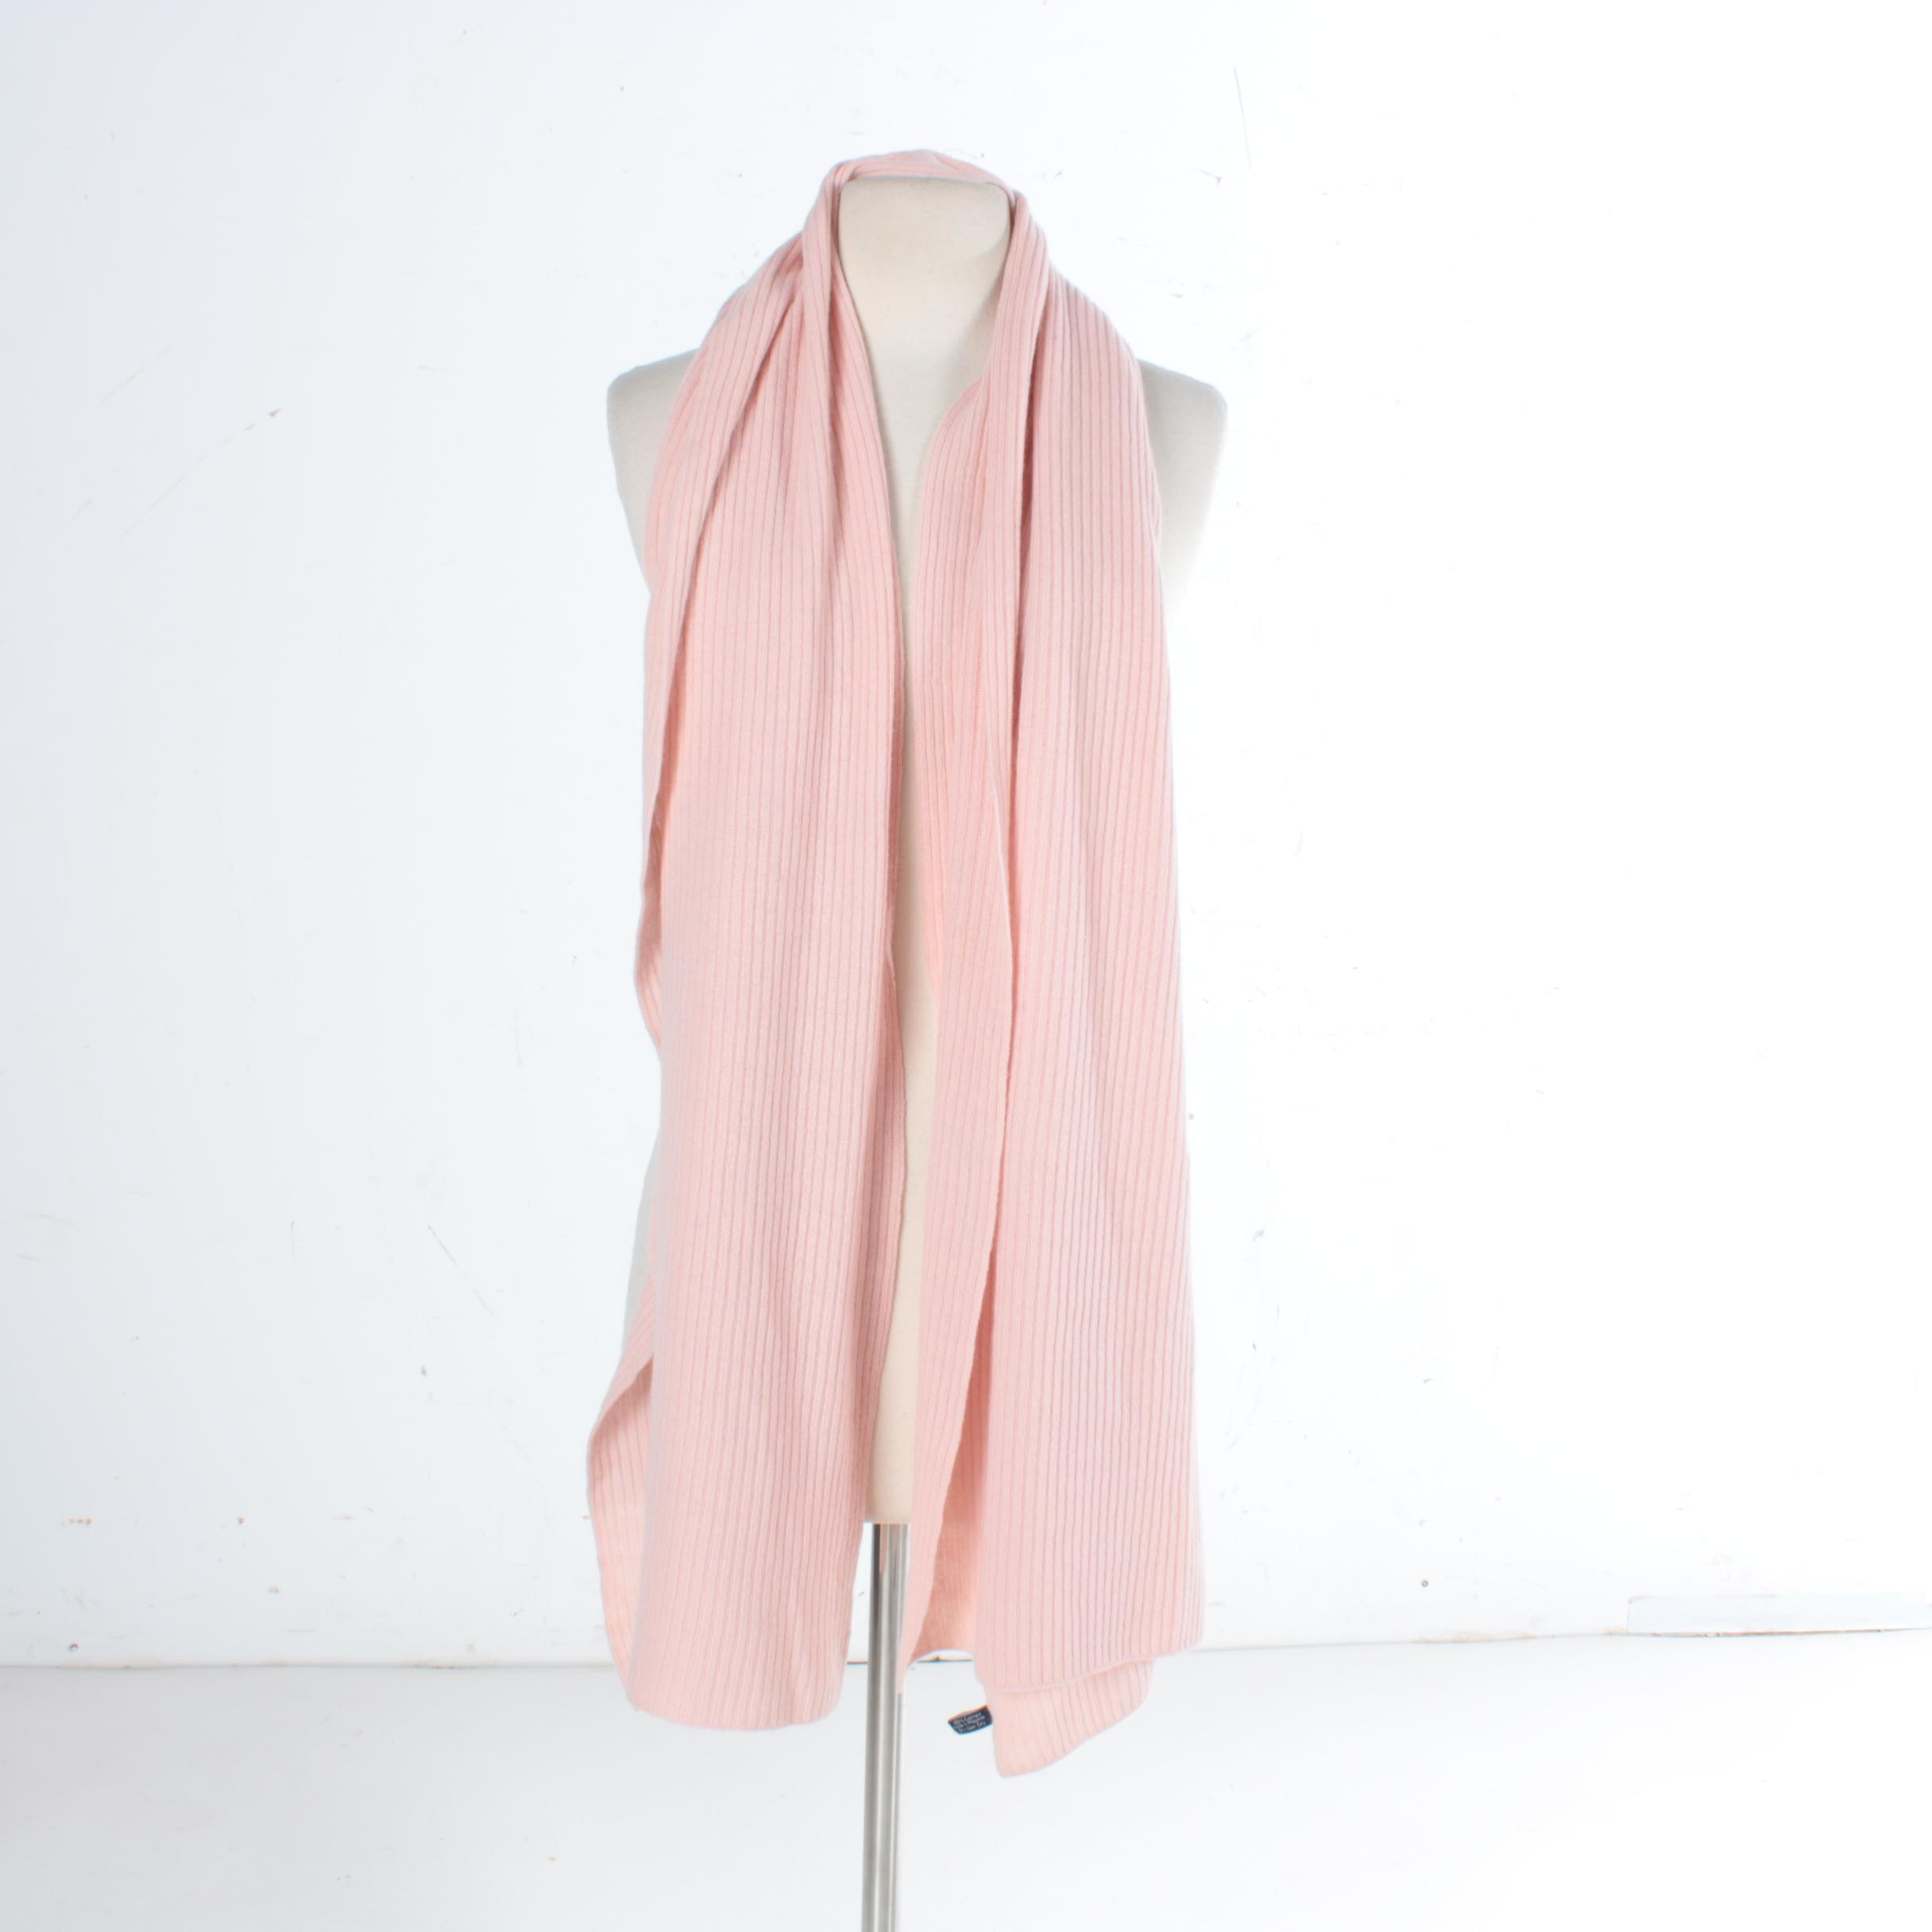 Ann Taylor Light Pink Cashmere Knit Scarf